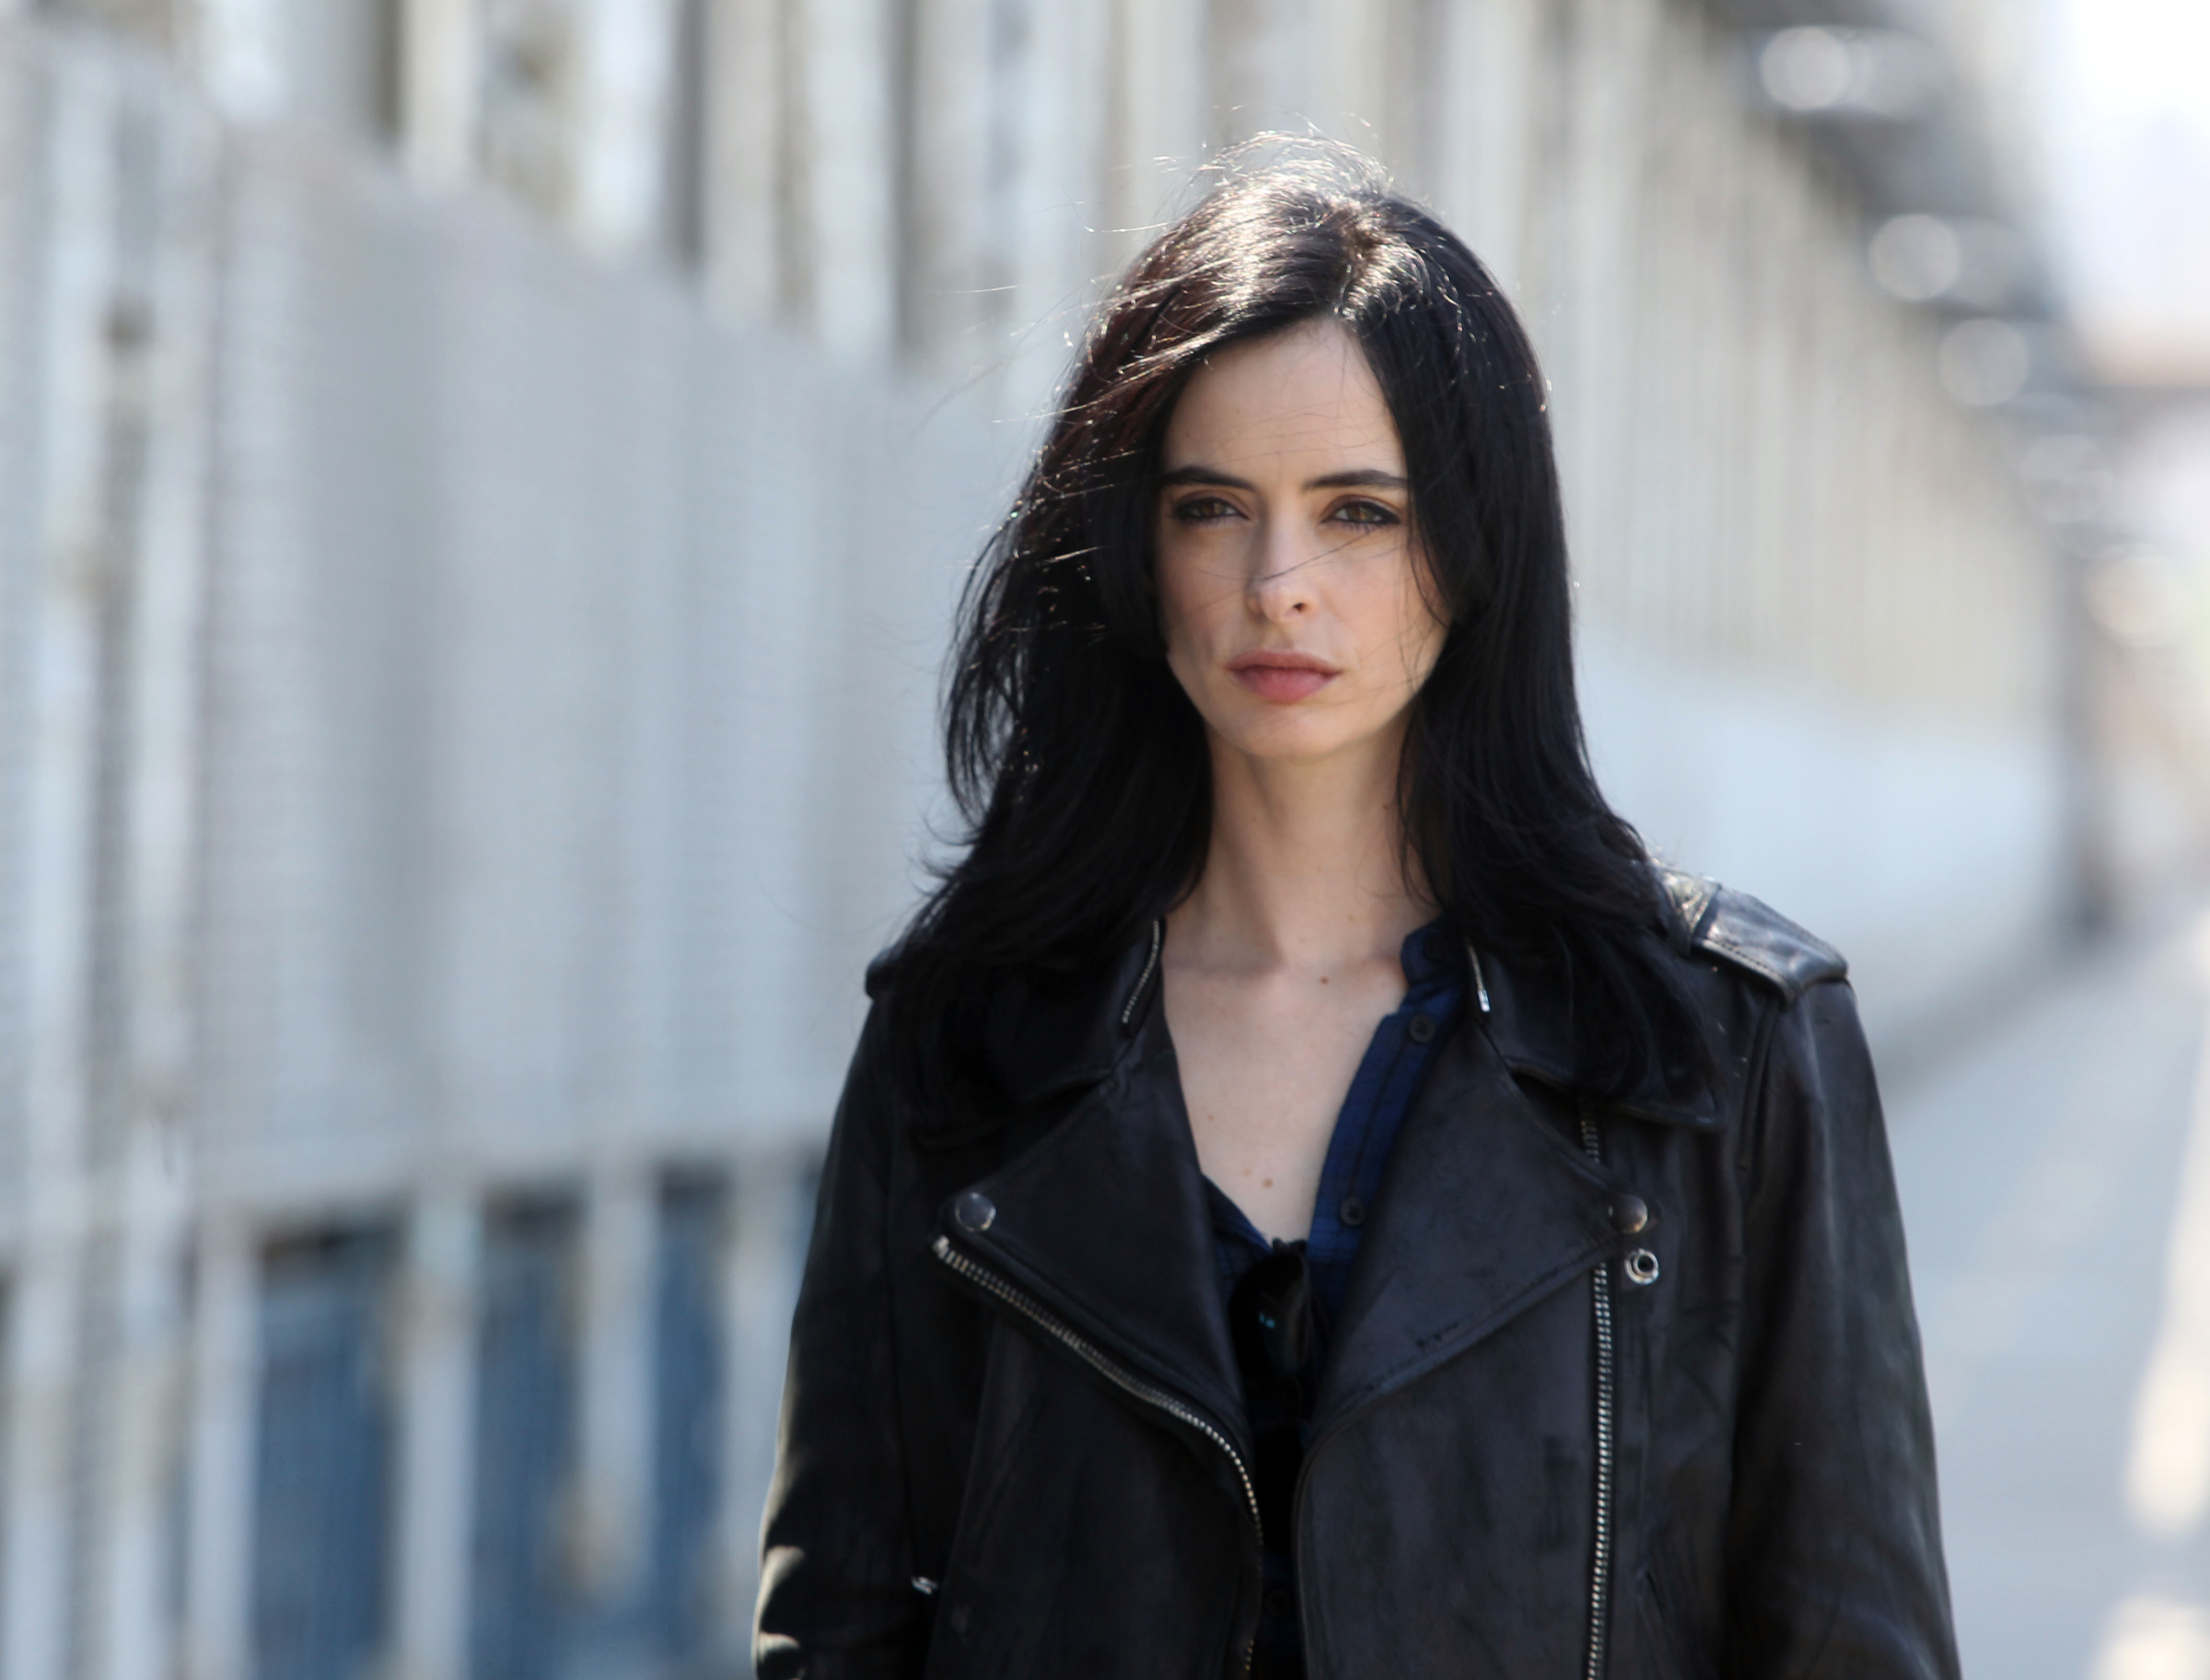 Krysten Ritter filming Marvel Productions/Netflix's  A.K.A. Jessica Jones on June 2, 2015 in New York City.